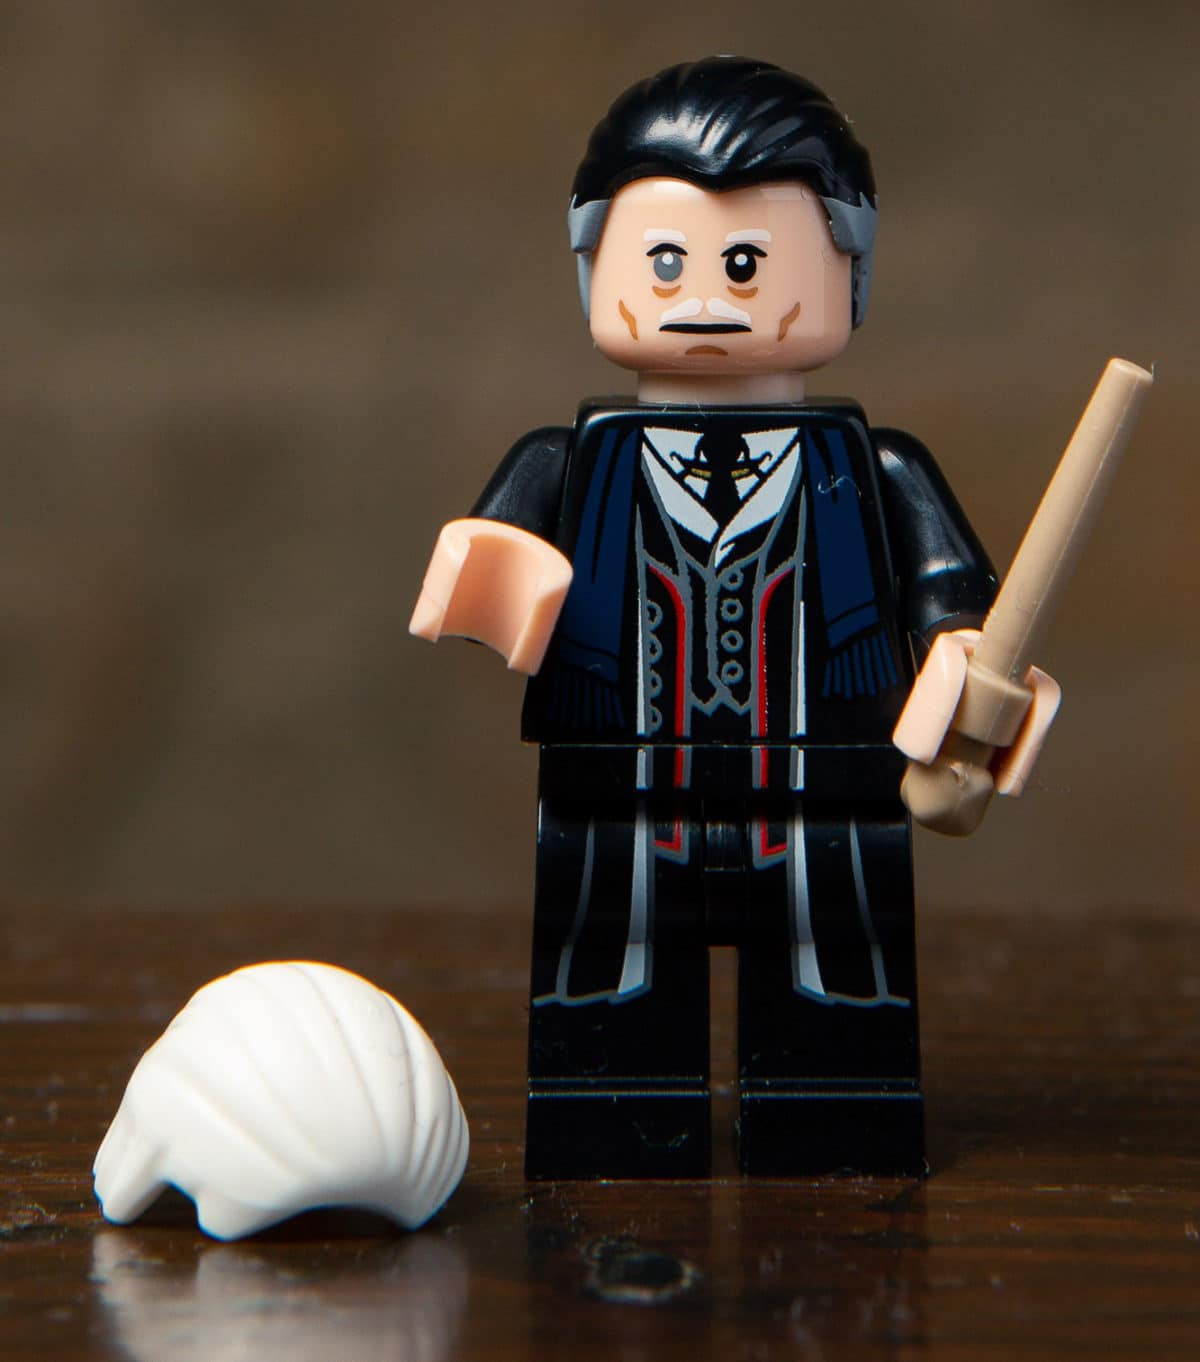 LEGO 71022 Percival Graves